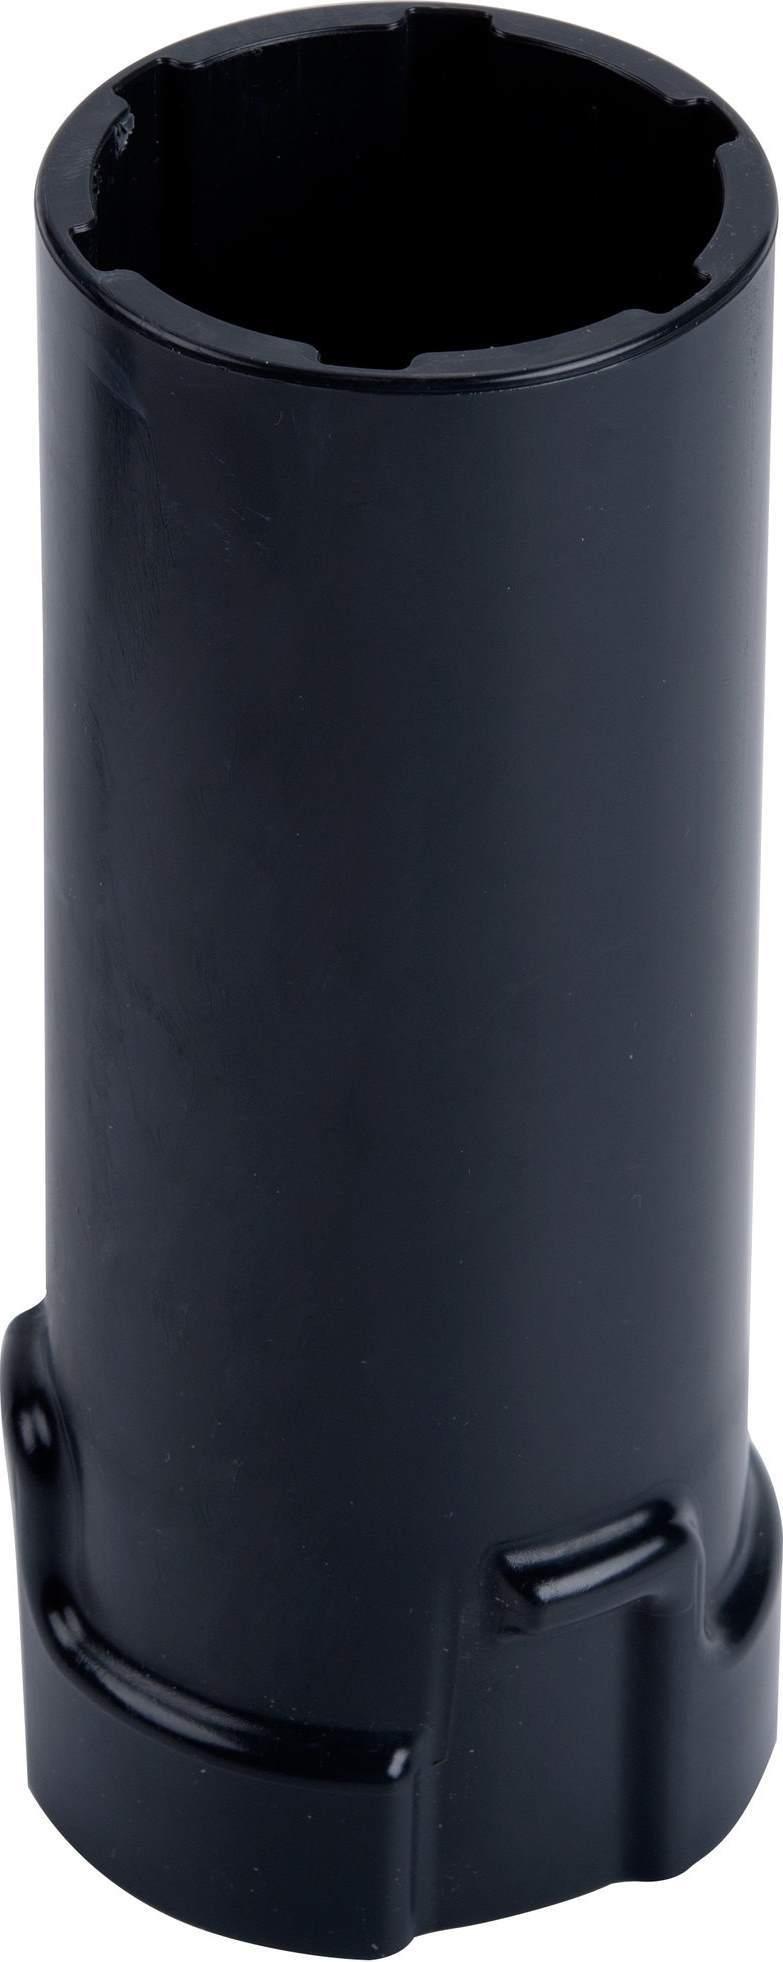 Диск-слайсер Robot Coupe 28194 (1мм) для петрушки - 7